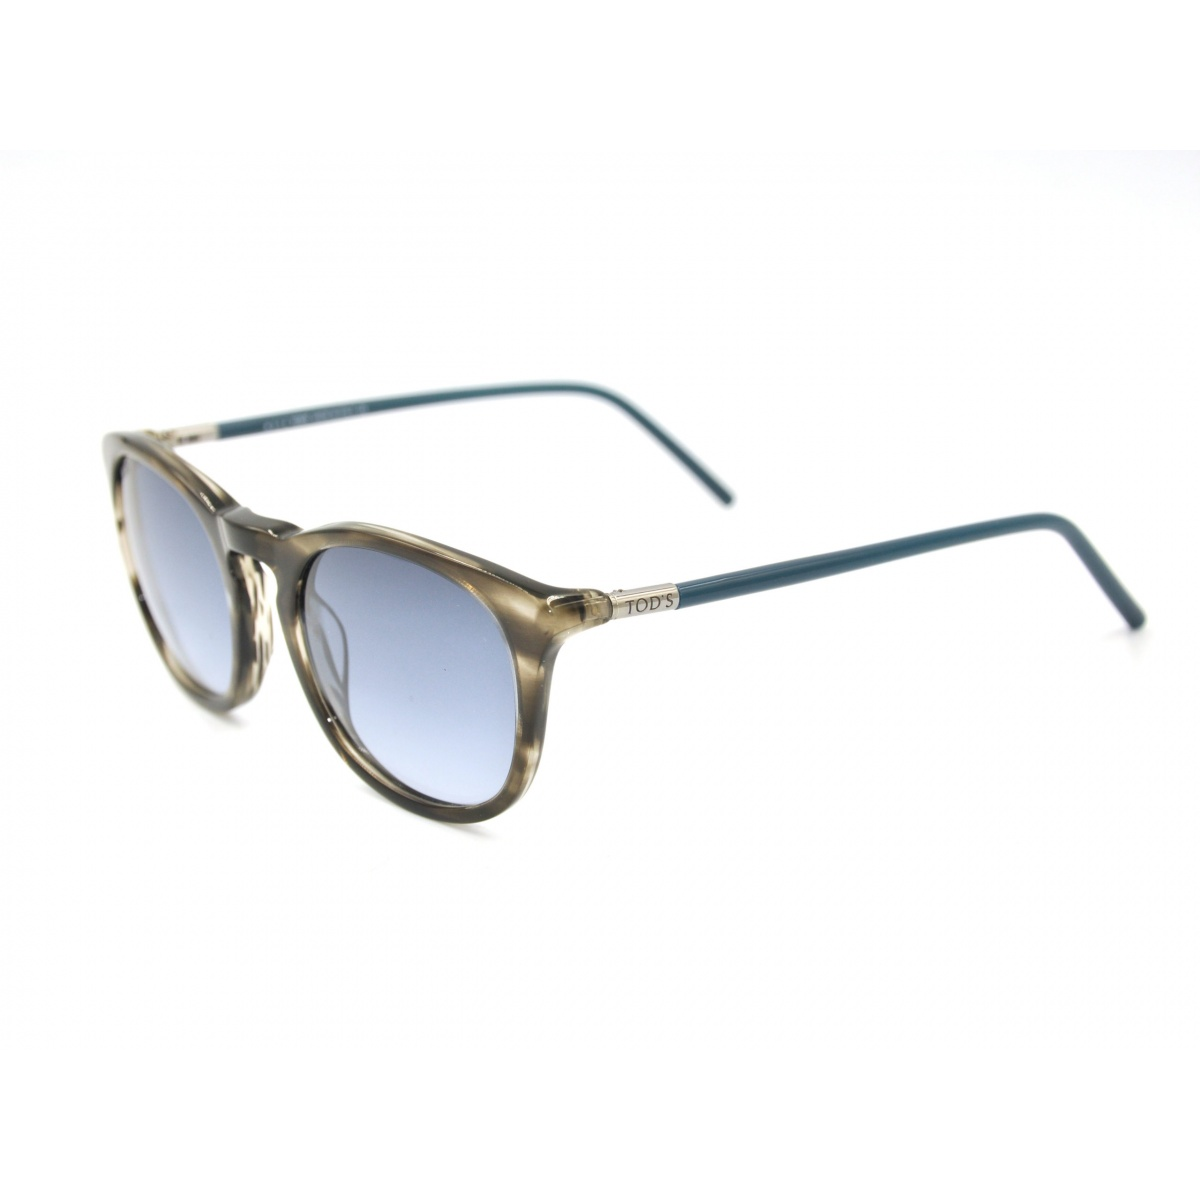 TODS TO122 20B UNISEX Sunglasses 2020